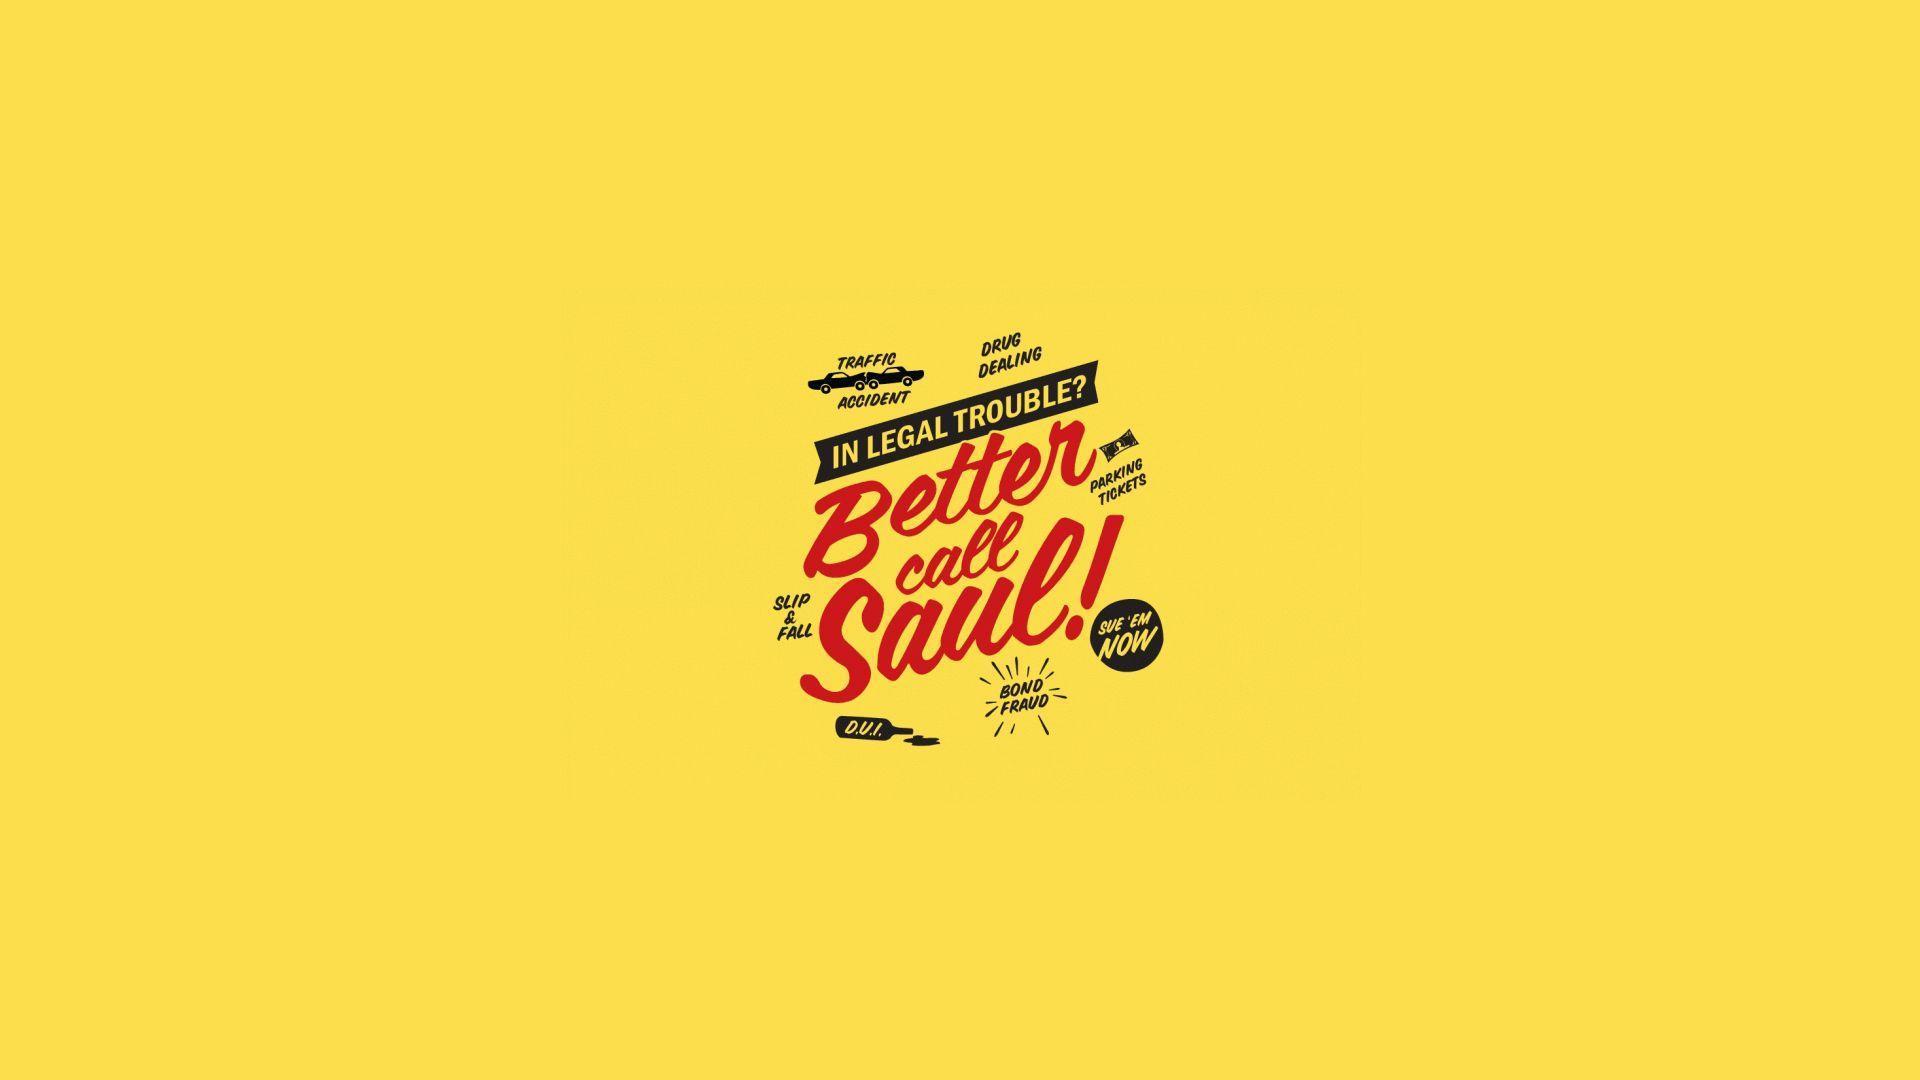 Better Call Saul Wallpapers Top Free Better Call Saul